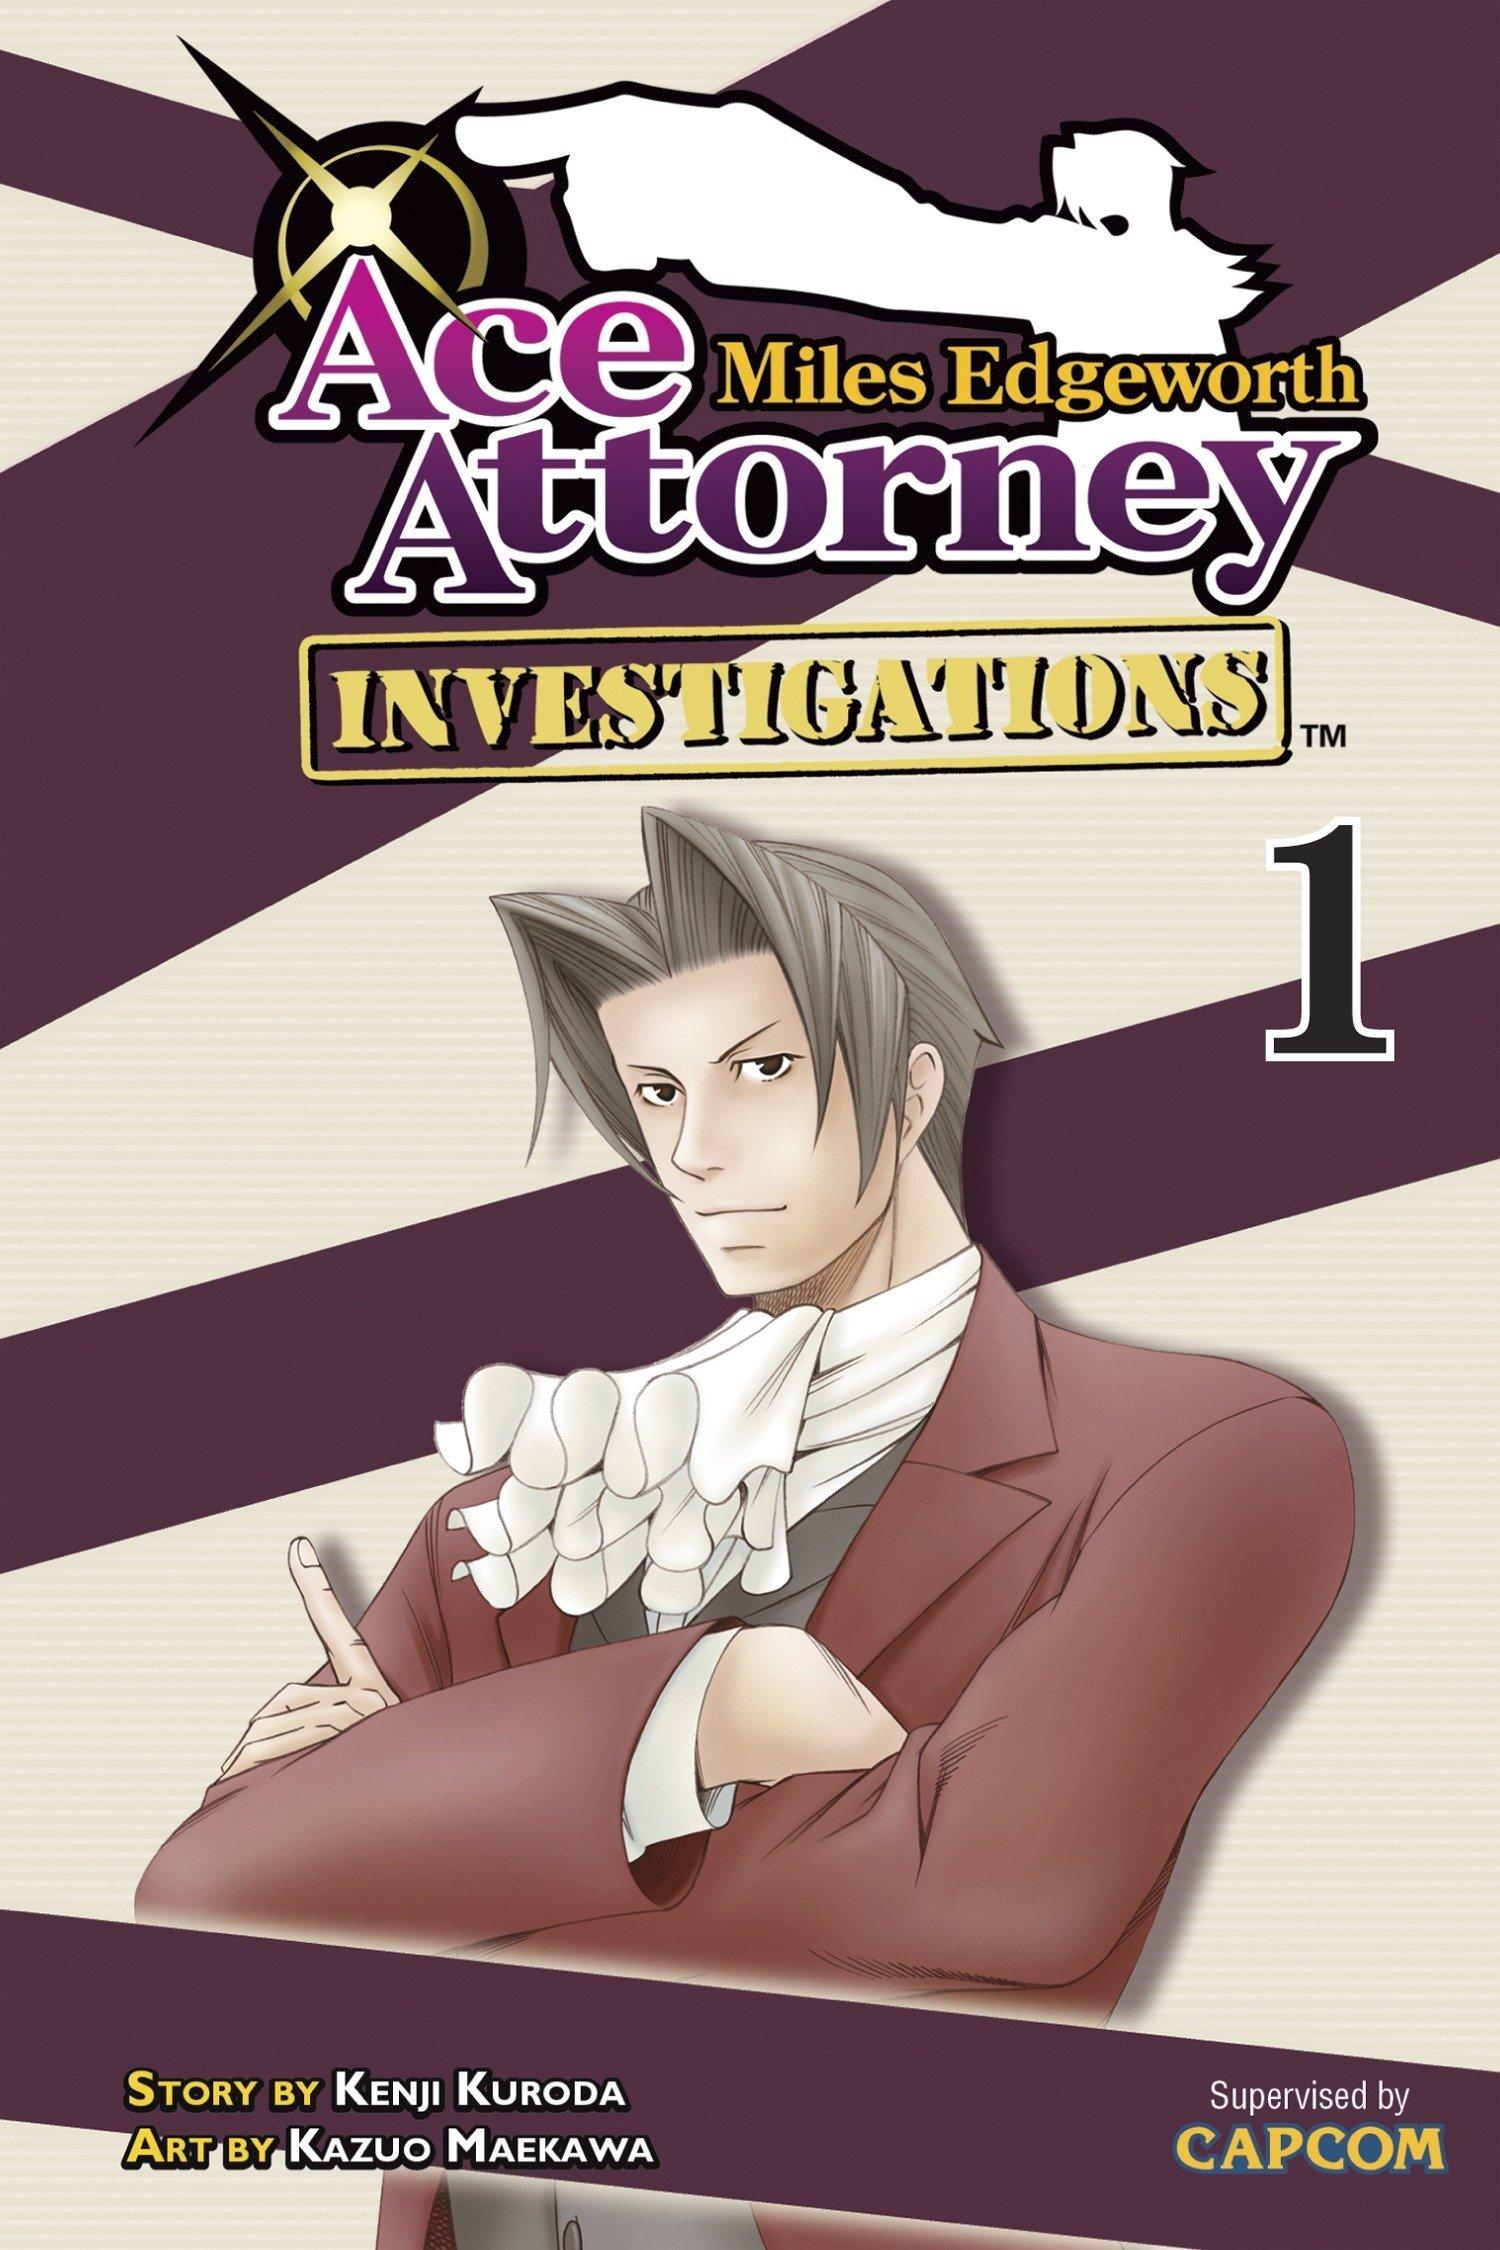 Miles Edgeworth Ace Attorney Investigations 1 Kenji Kuroda